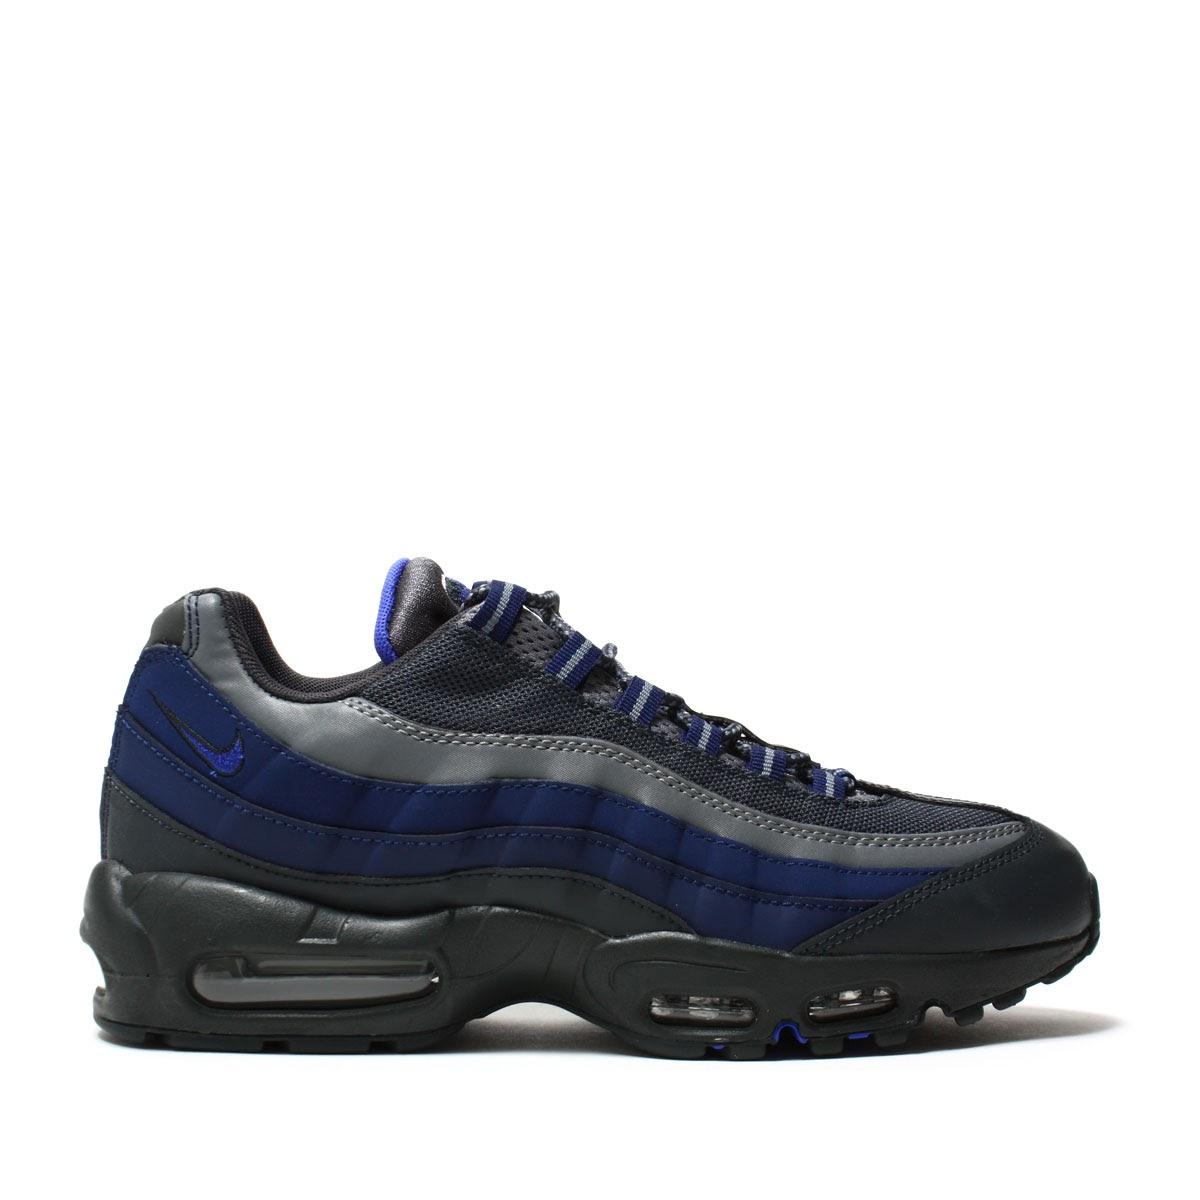 NIKE AIR MAX 95 ESSENTIAL (Nike Air Max 95 essential) (ANTHRACITE/PARAMOUNT BLUE-BINARY BLUE-COOL GREY-WOLF GREY) 17 SP-I